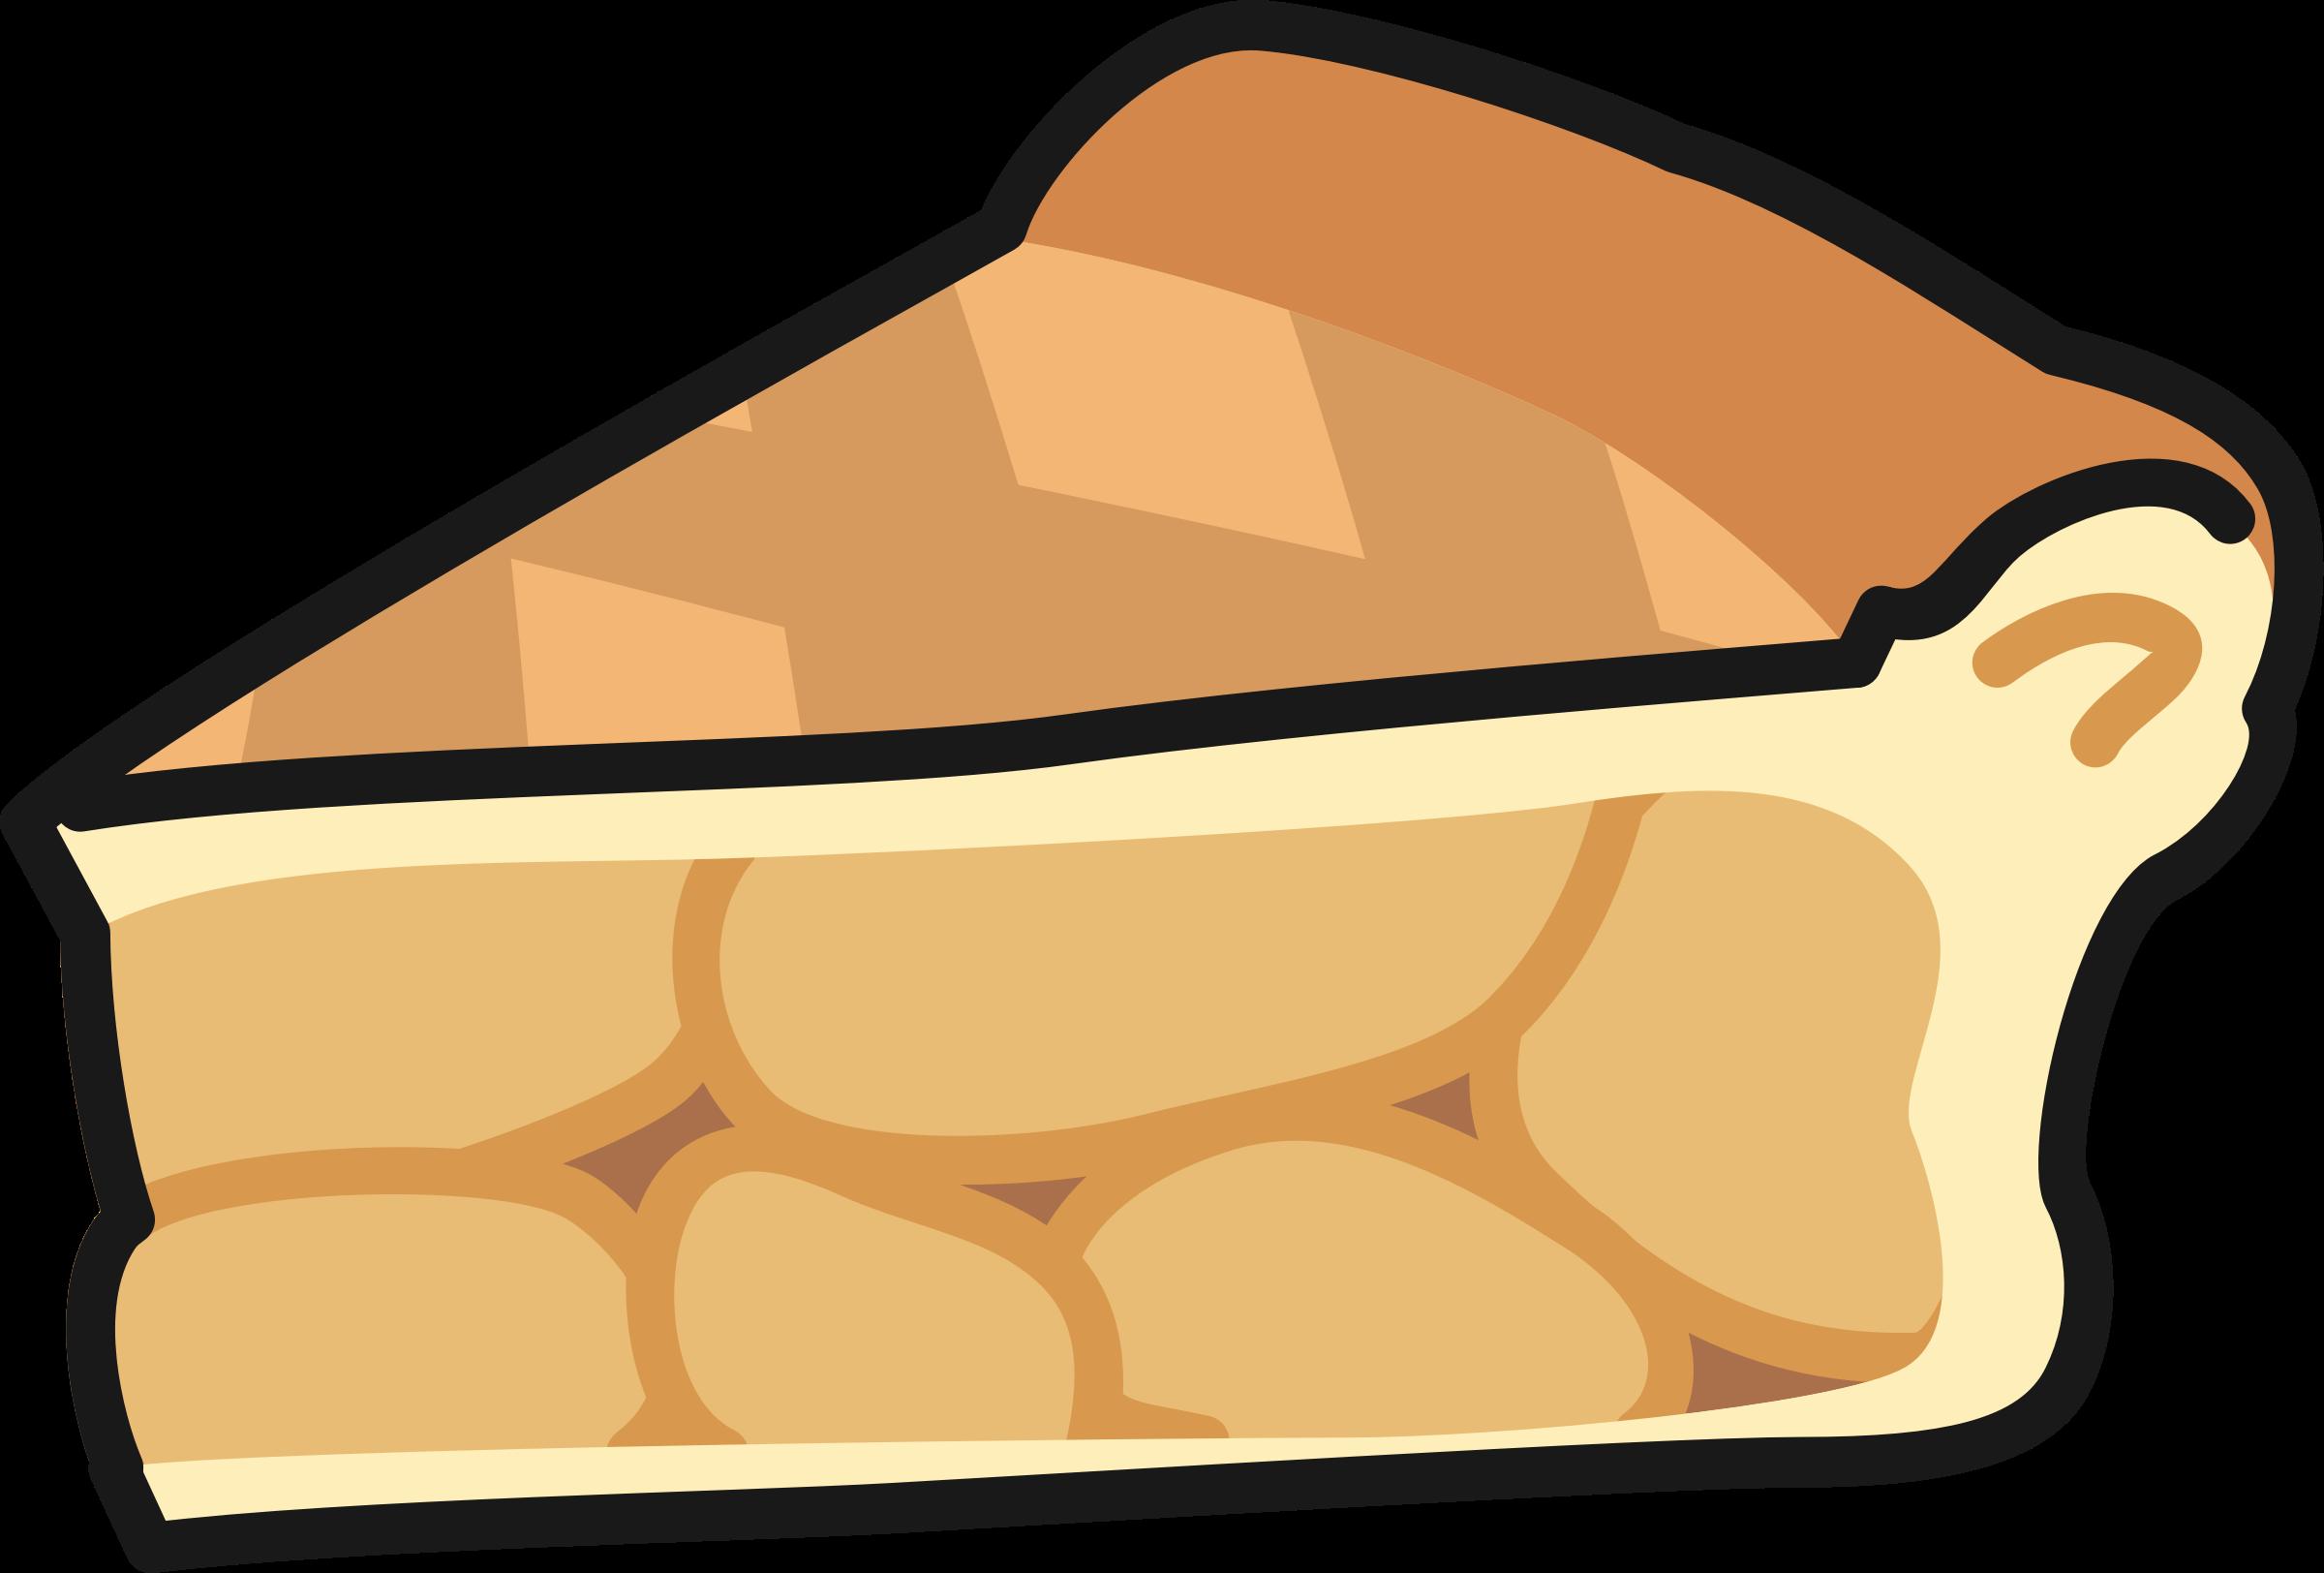 jpg free stock Pie clipart. Apple big image png